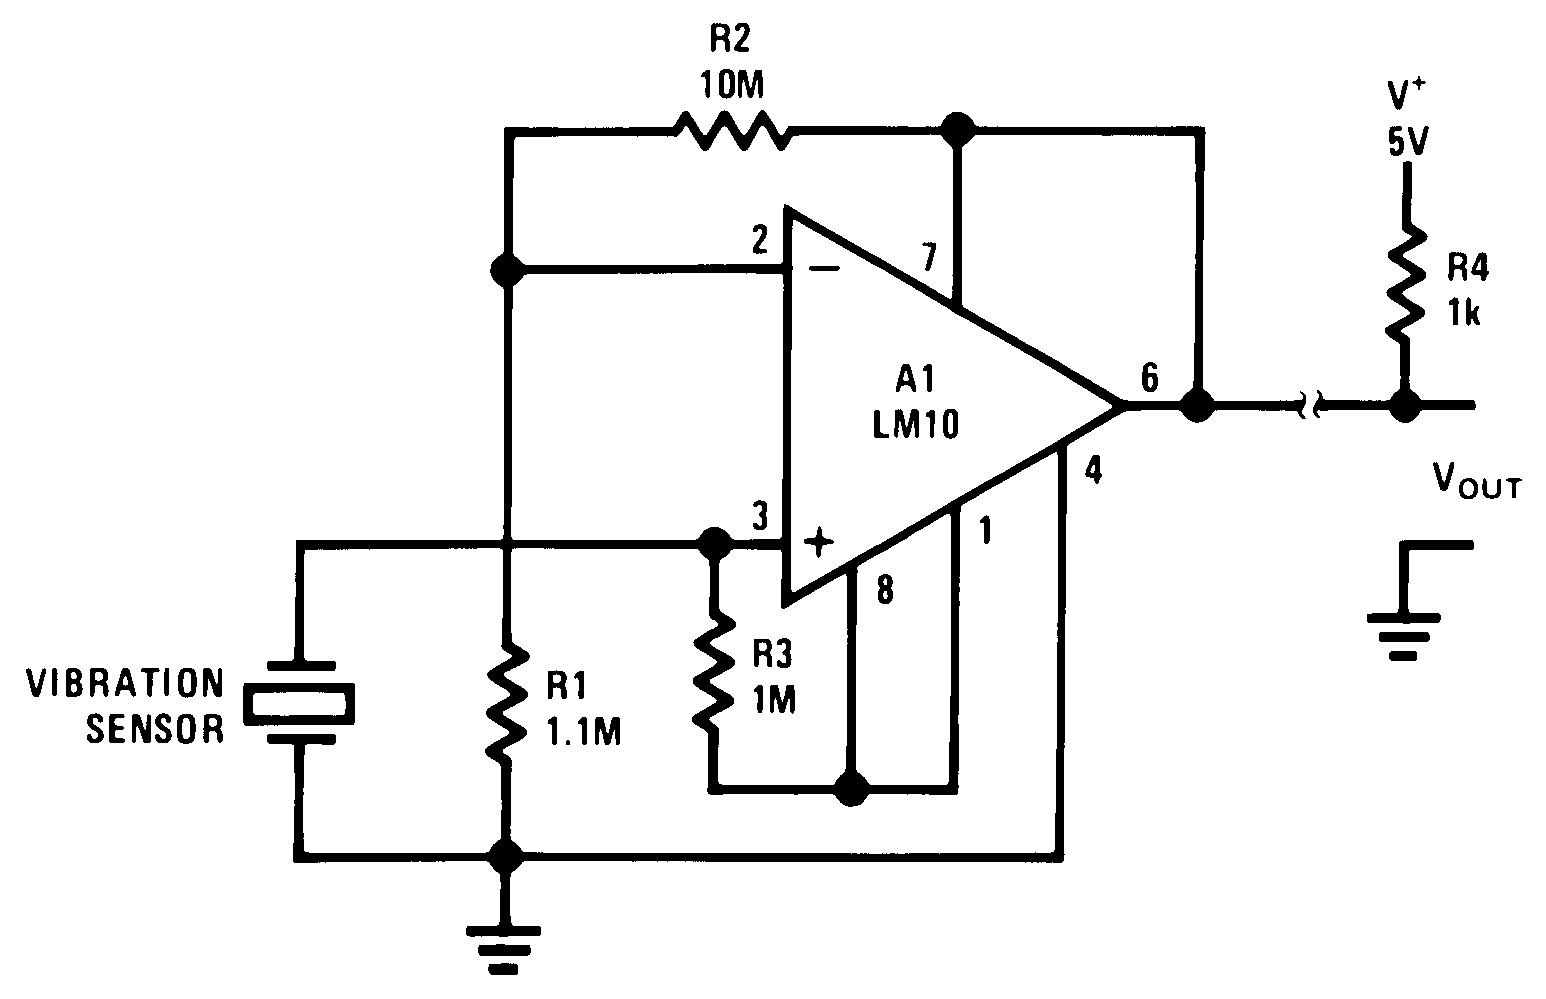 Rosemount Pt100 Rtd Wiring Solutions 3 Wire Sensor Diagram Duplex Best Image 2018 Data Sheet 214c Temperature